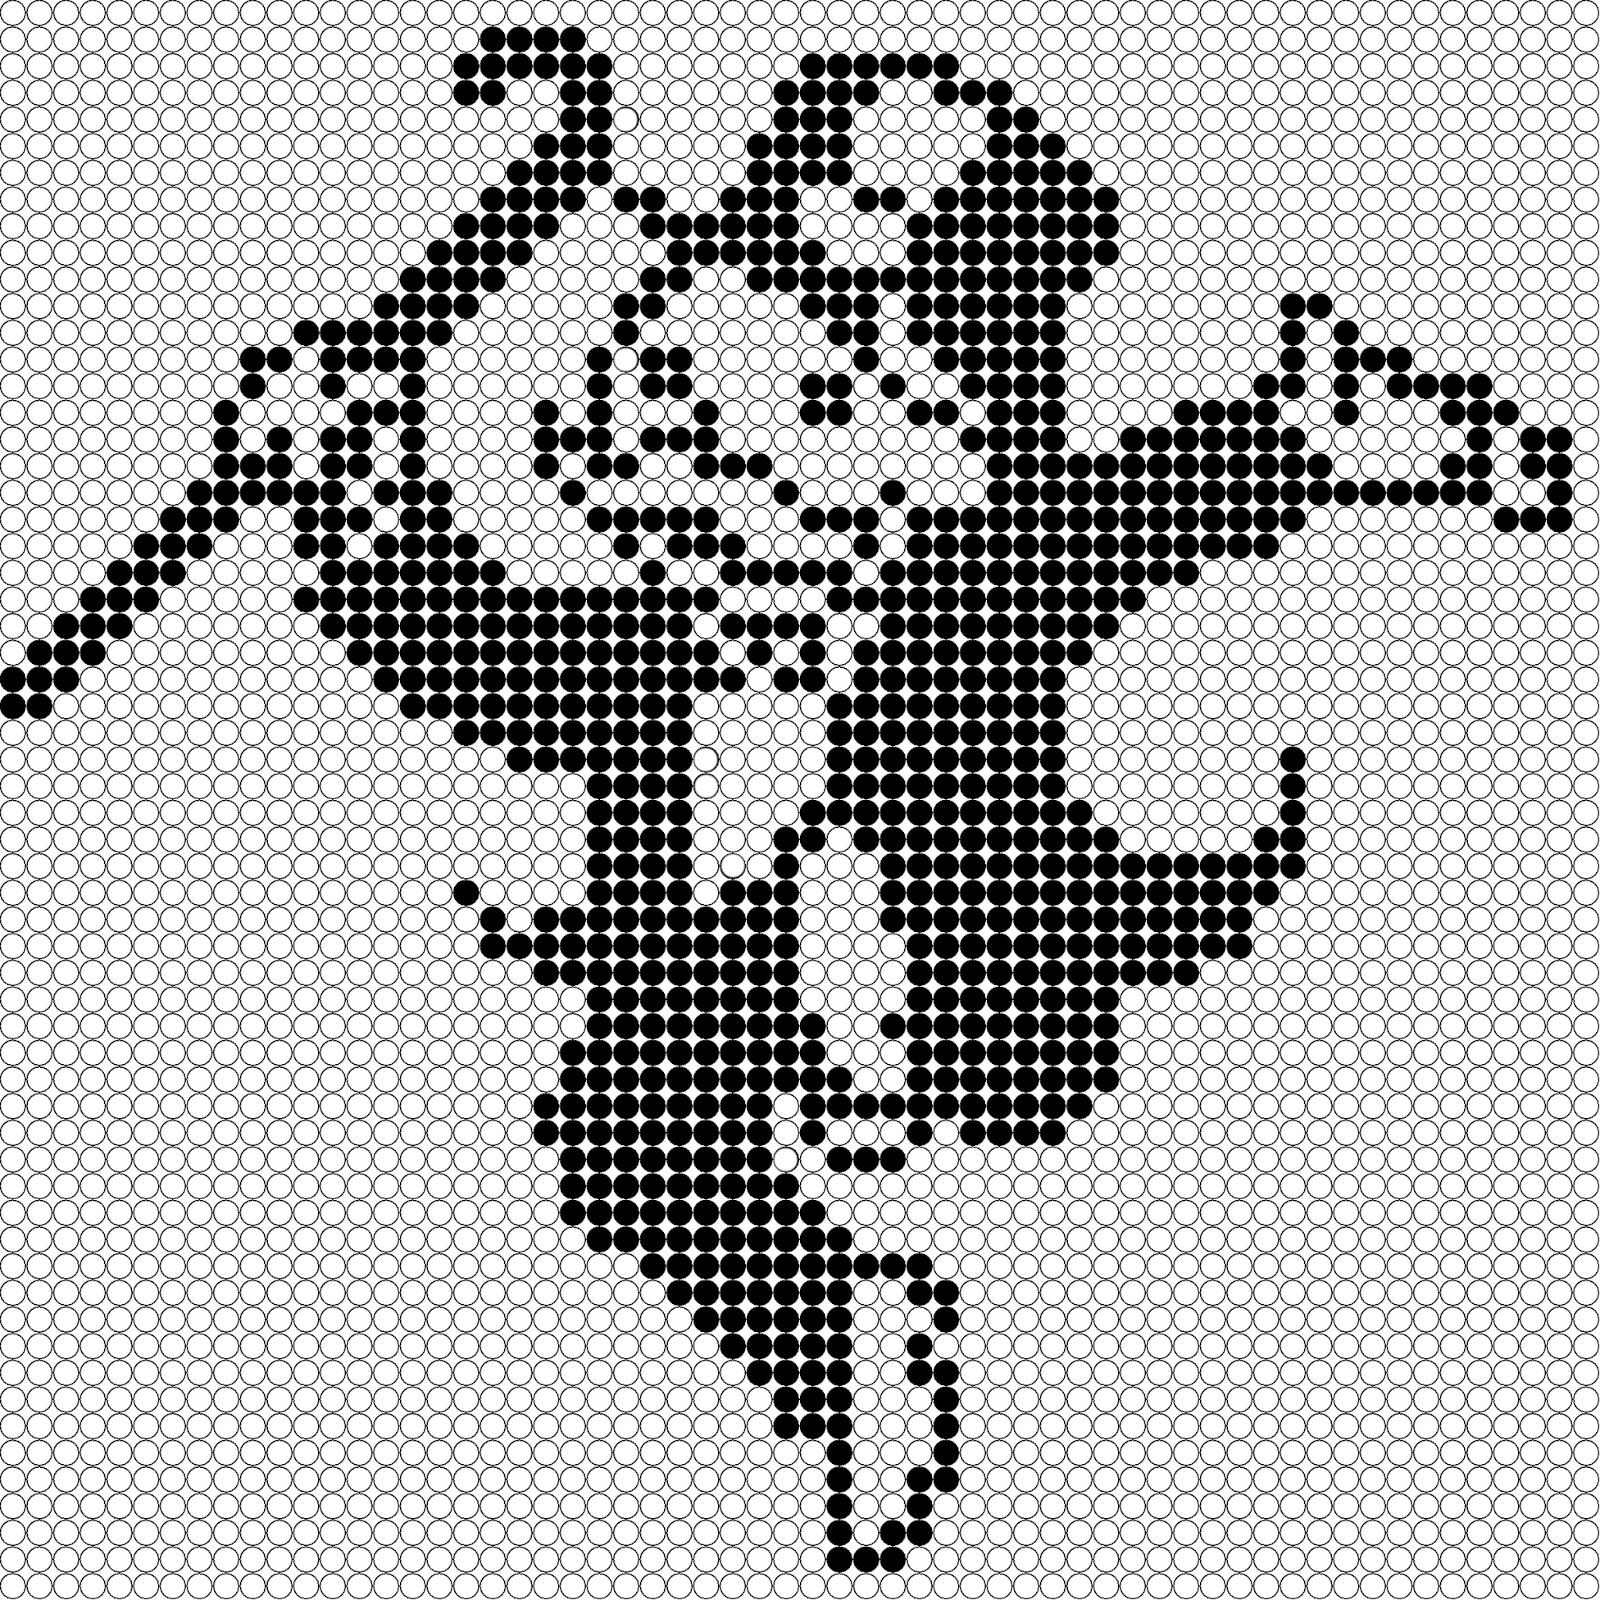 pixel art noir et blanc